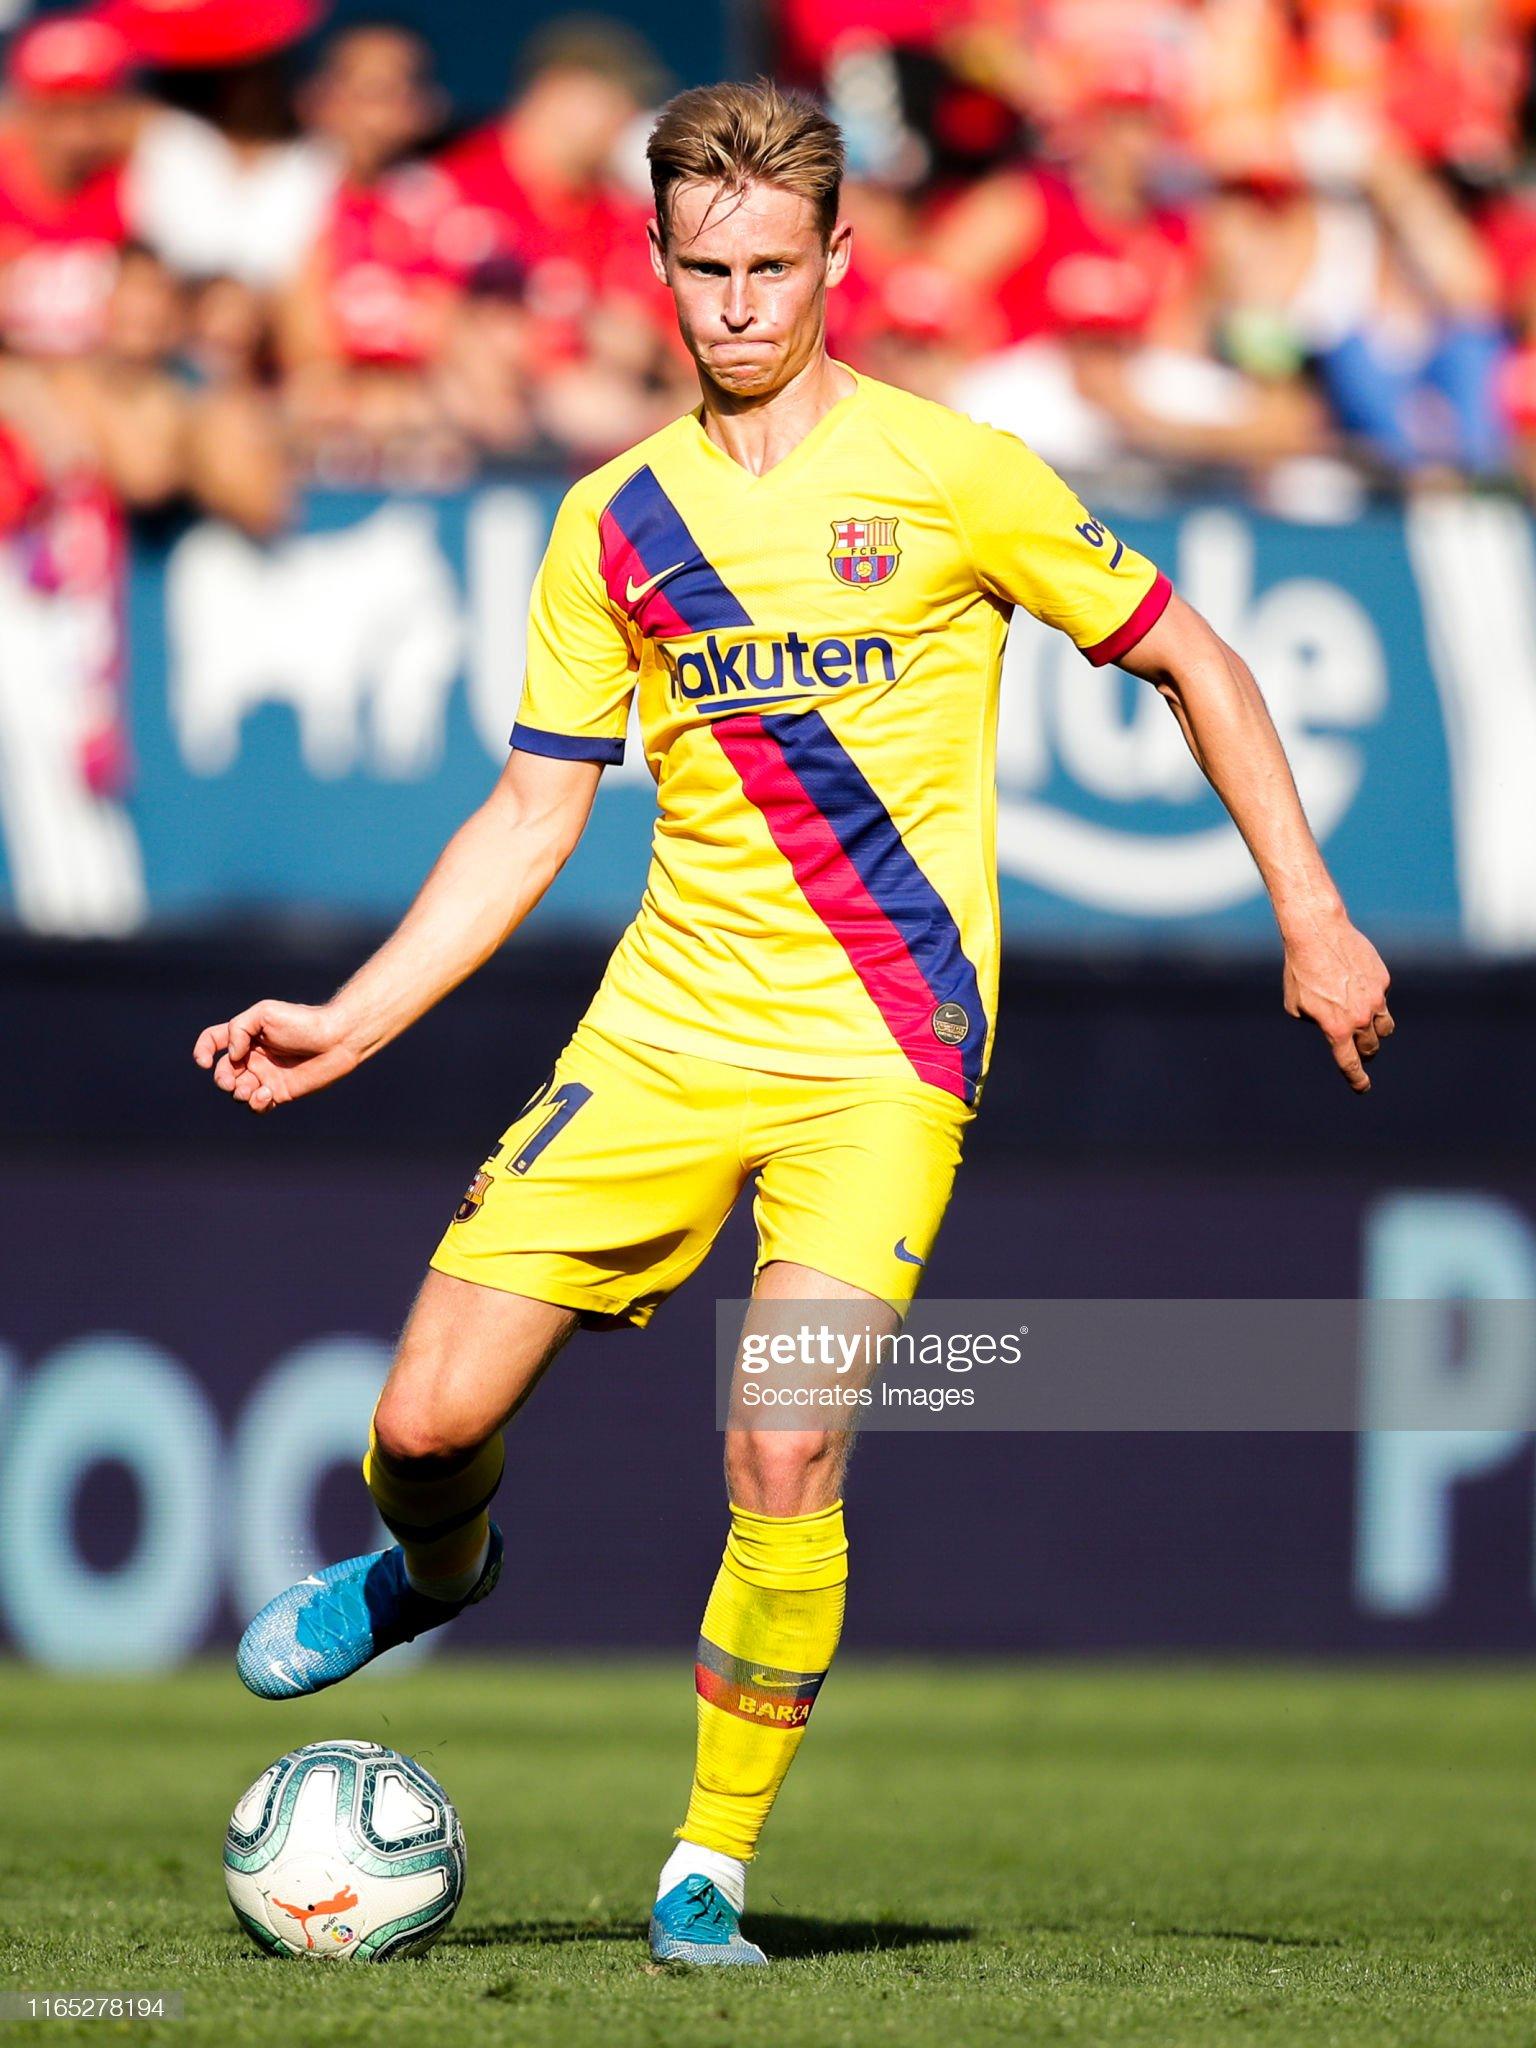 صور مباراة : أوساسونا - برشلونة 2-2 ( 31-08-2019 )  Frenkie-de-jong-of-fc-barcelona-during-the-la-liga-santander-match-picture-id1165278194?s=2048x2048